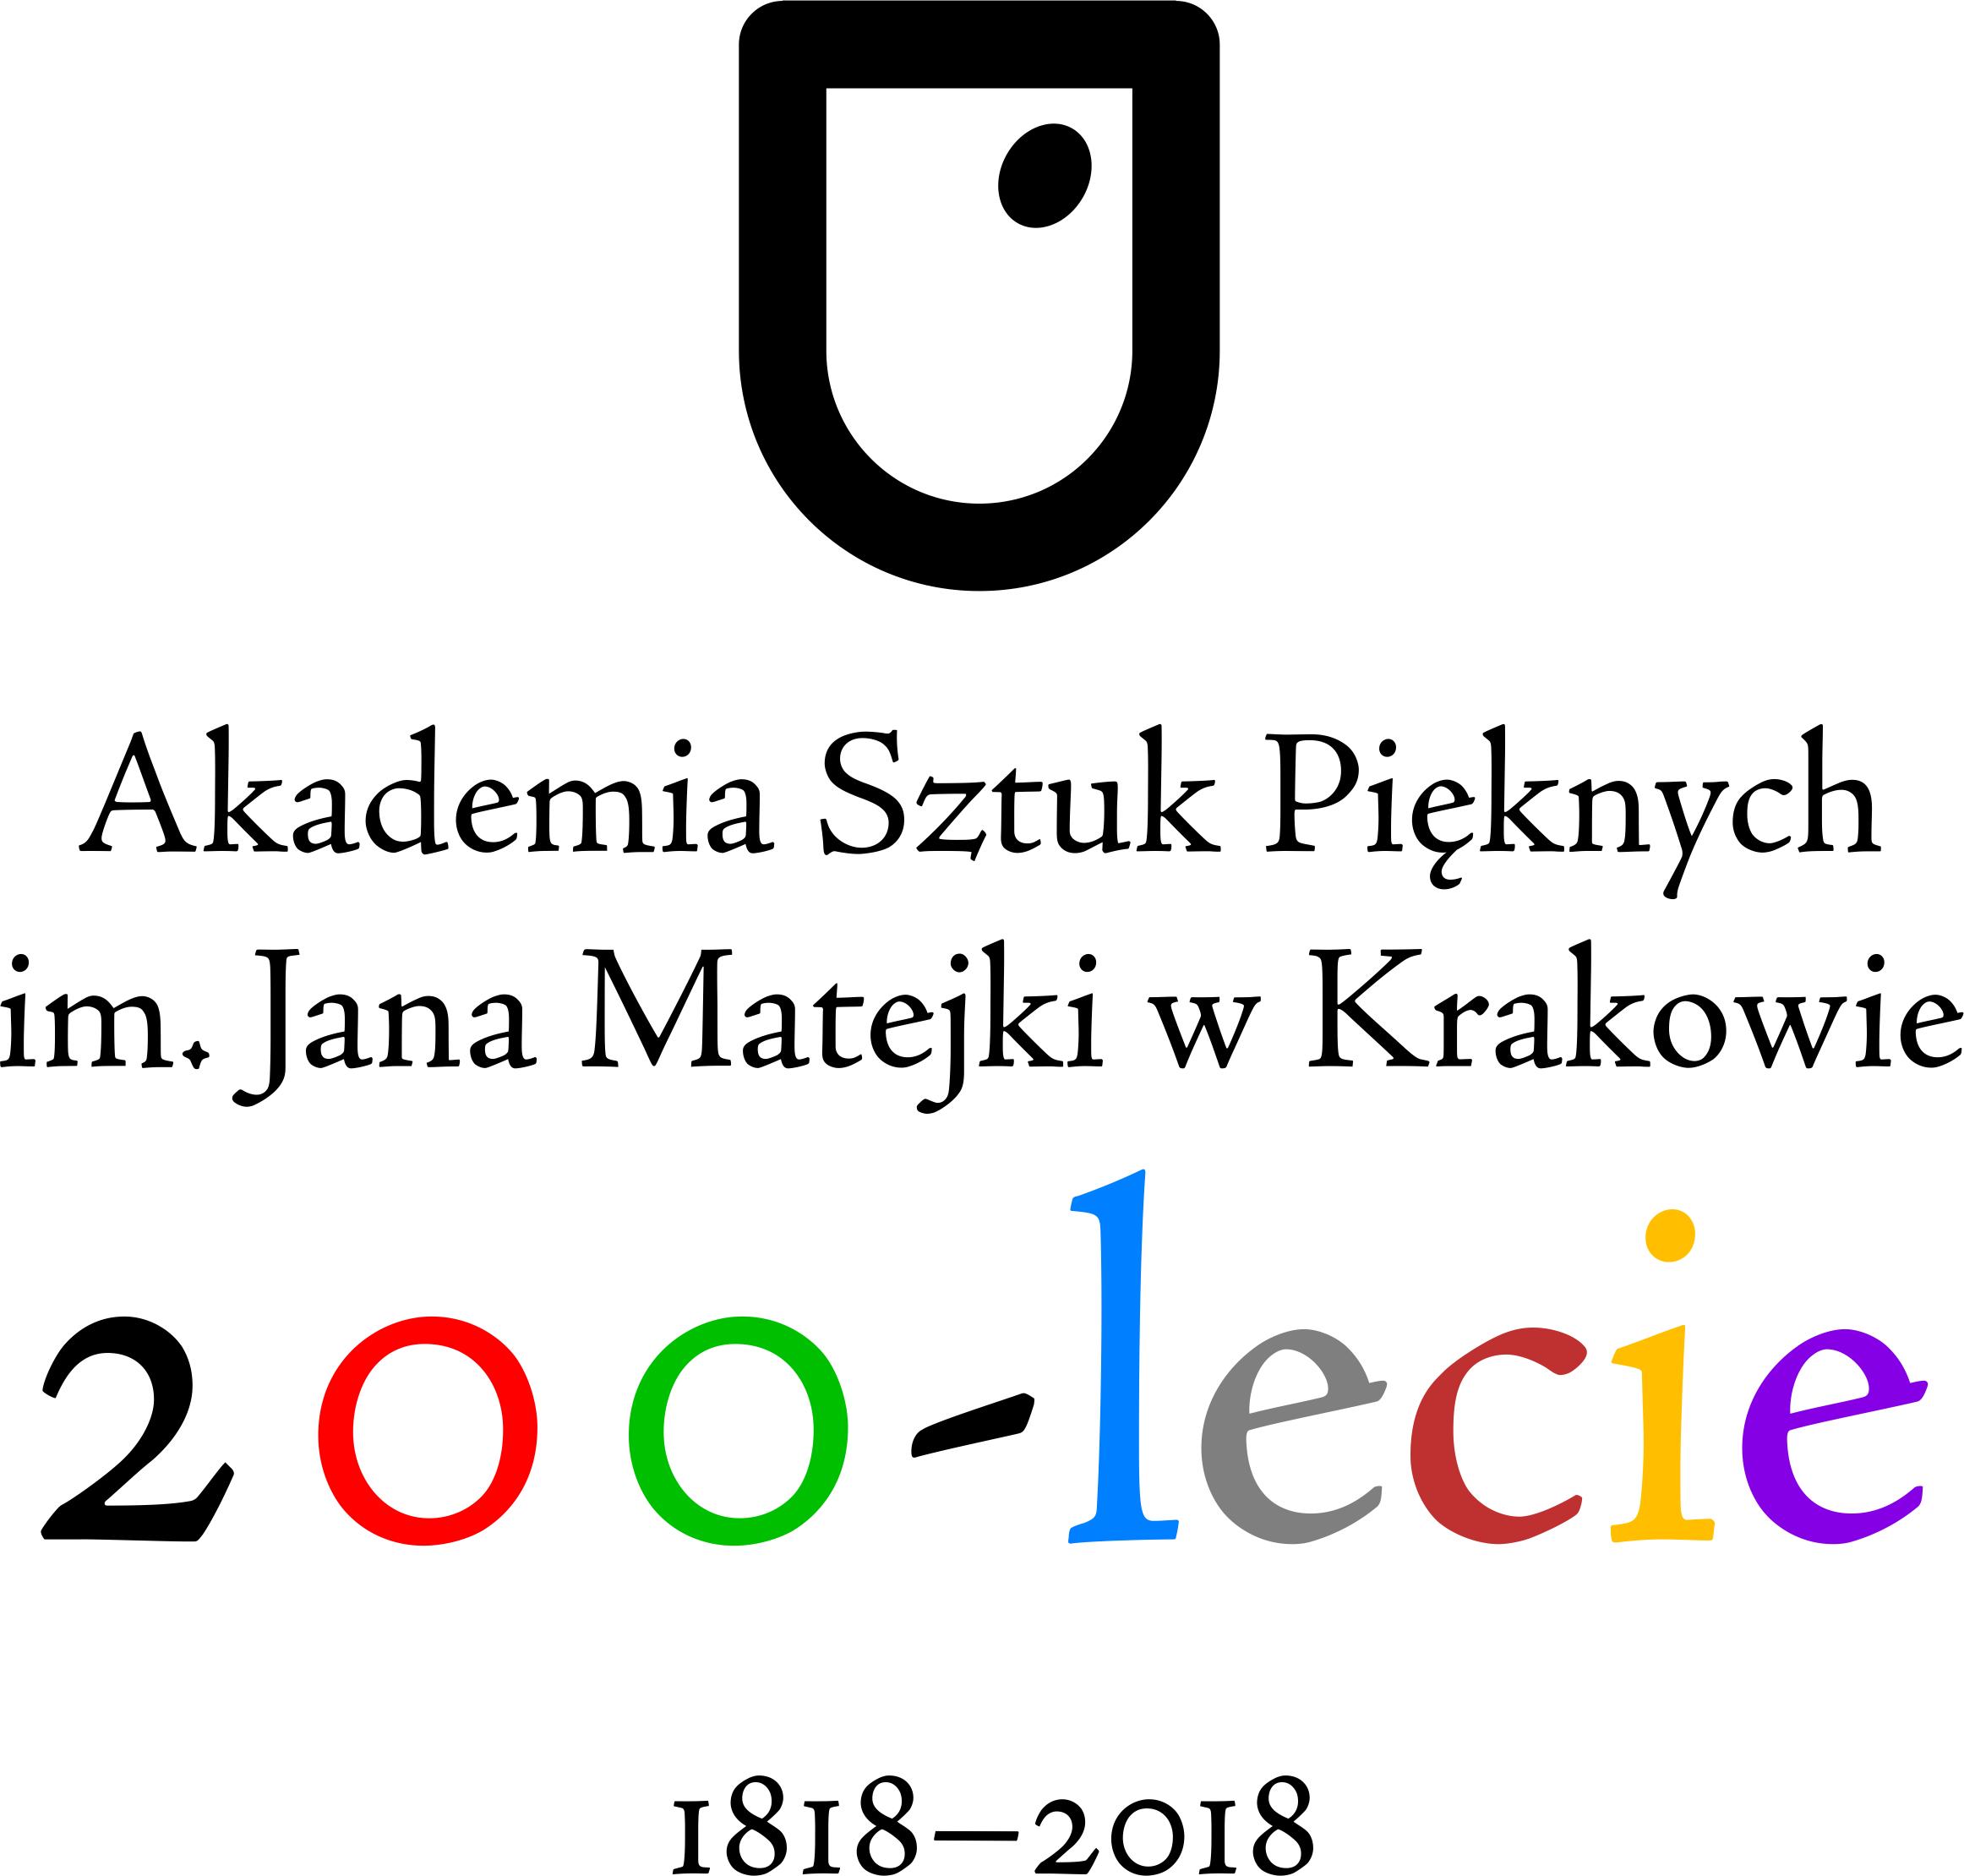 https://m.wmwm.pl/2017/07/orig/logo-jubileuszowe-asp-5761.jpg